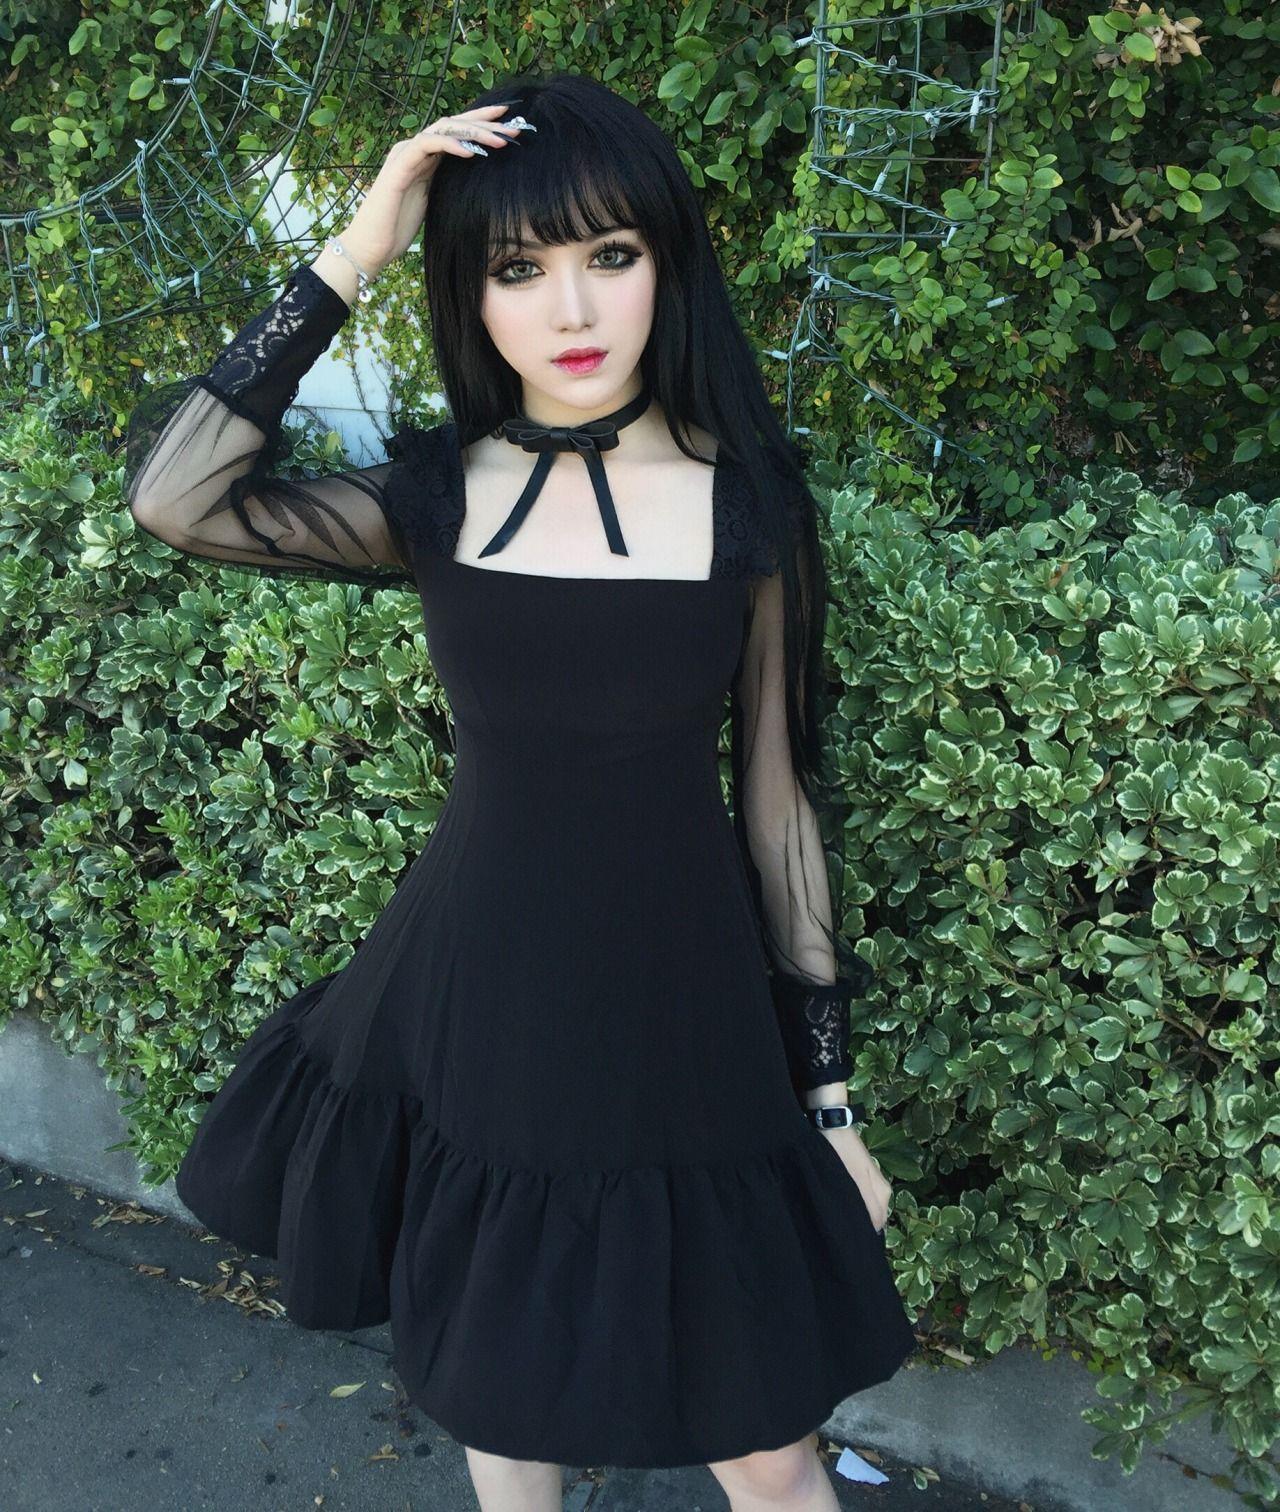 Asian goth girls